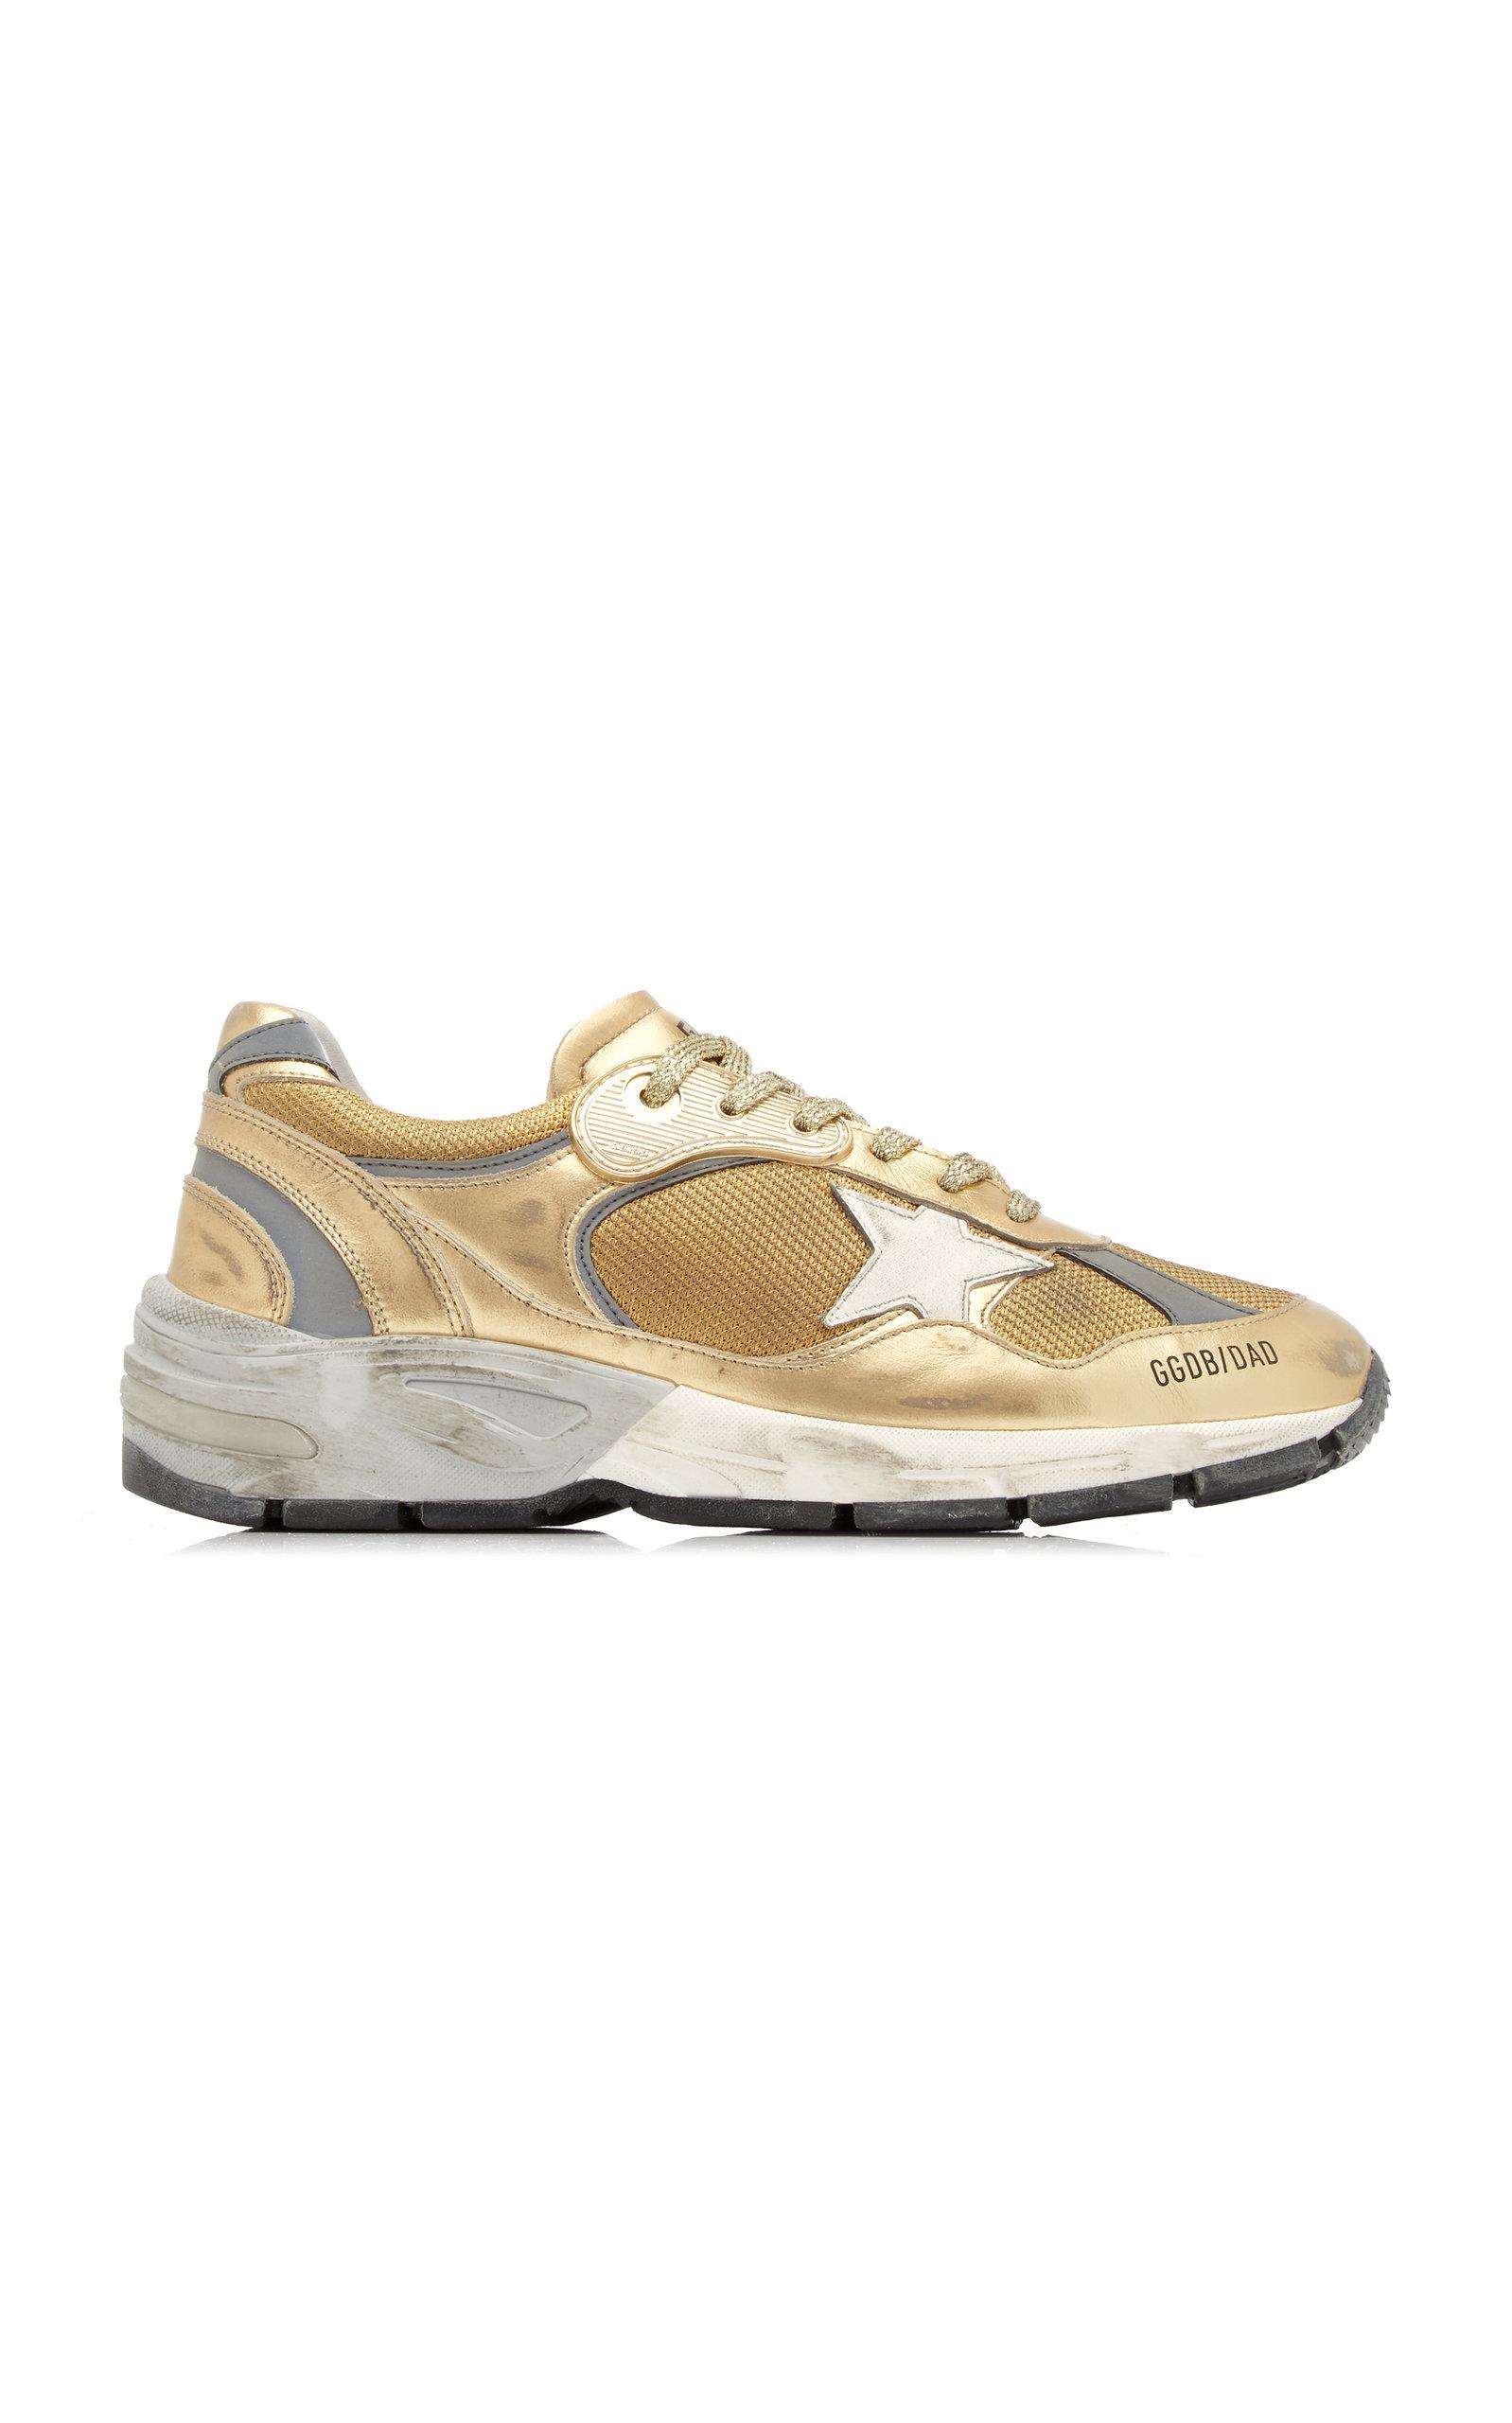 Golden Goose - Women's Running Dad Laminated Leather Sneakers - Gold - Moda Operandi